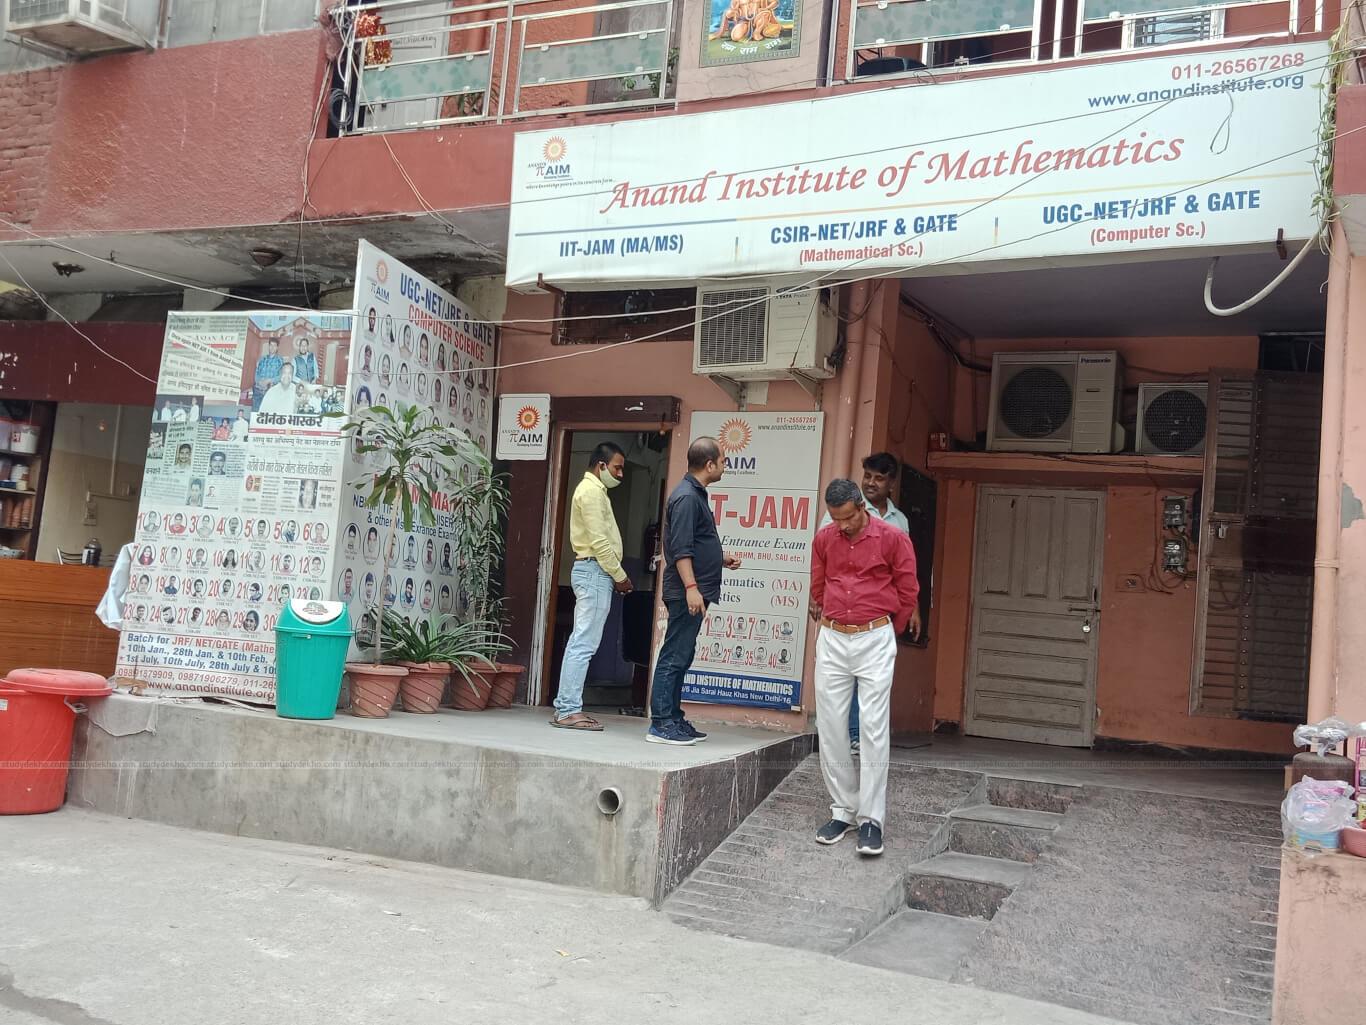 Anand Institute Of Mathematics Gallery